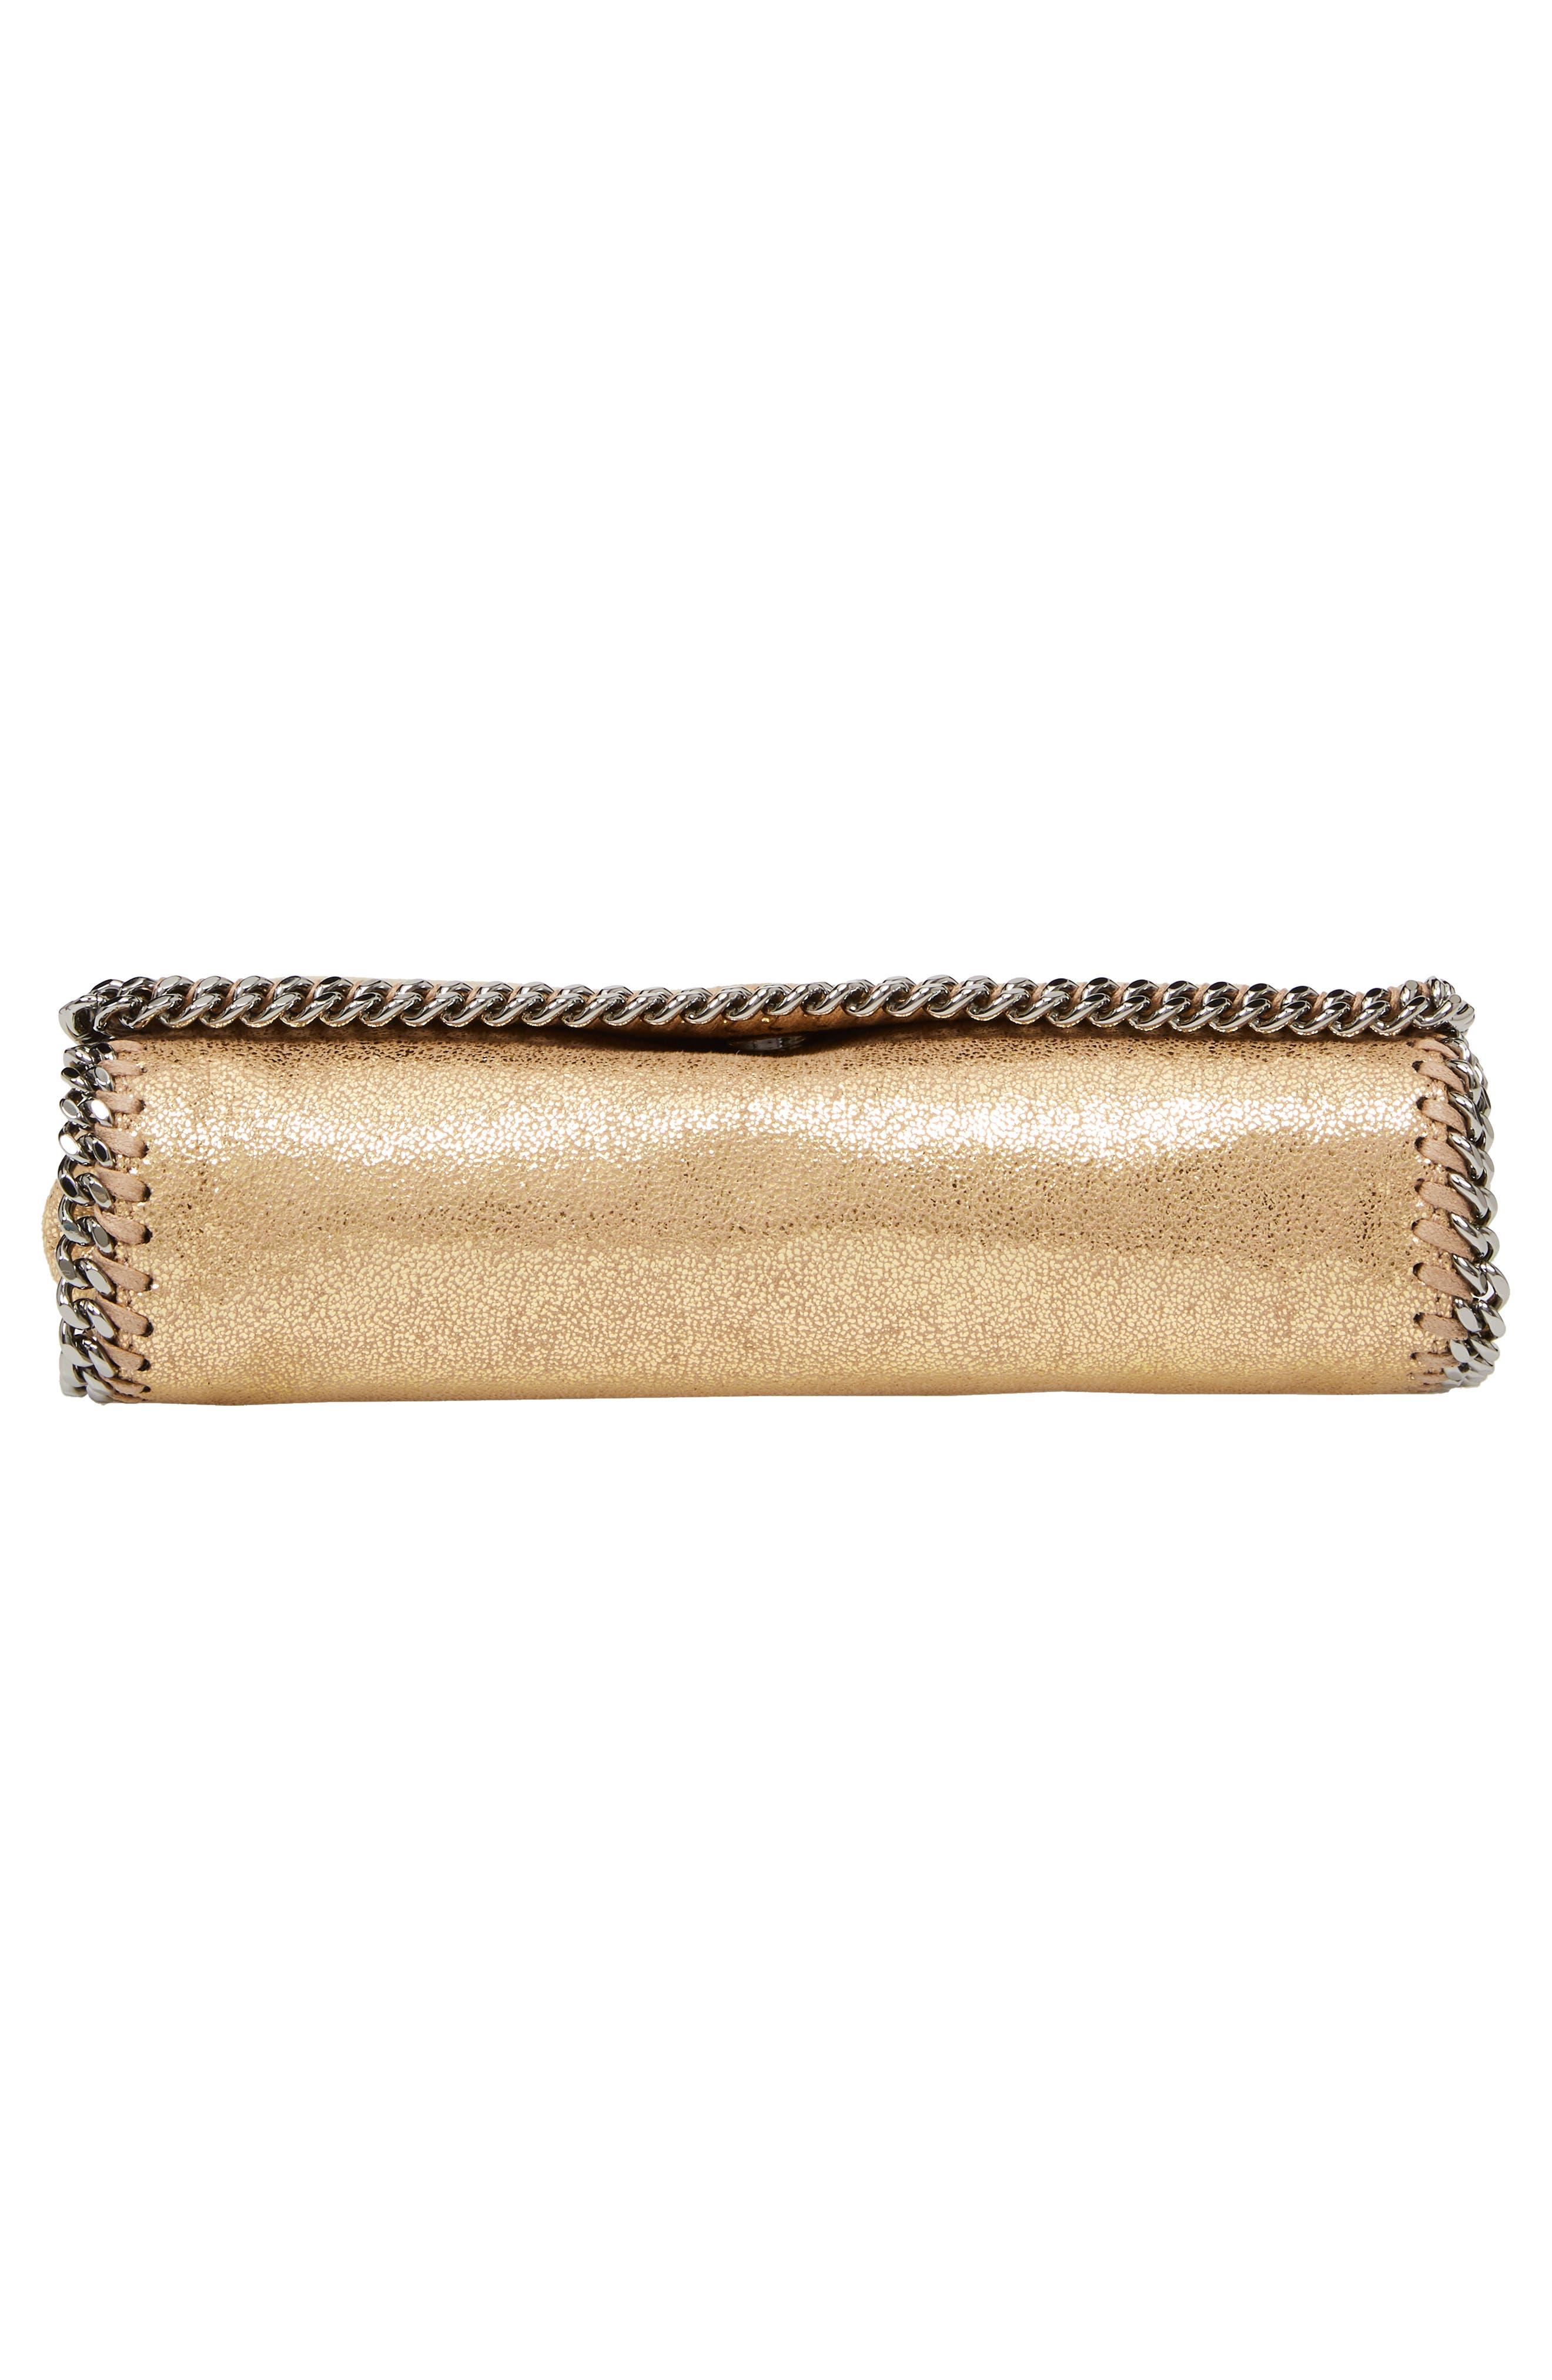 'Falabella' Crossbody Bag,                             Alternate thumbnail 6, color,                             GOLD